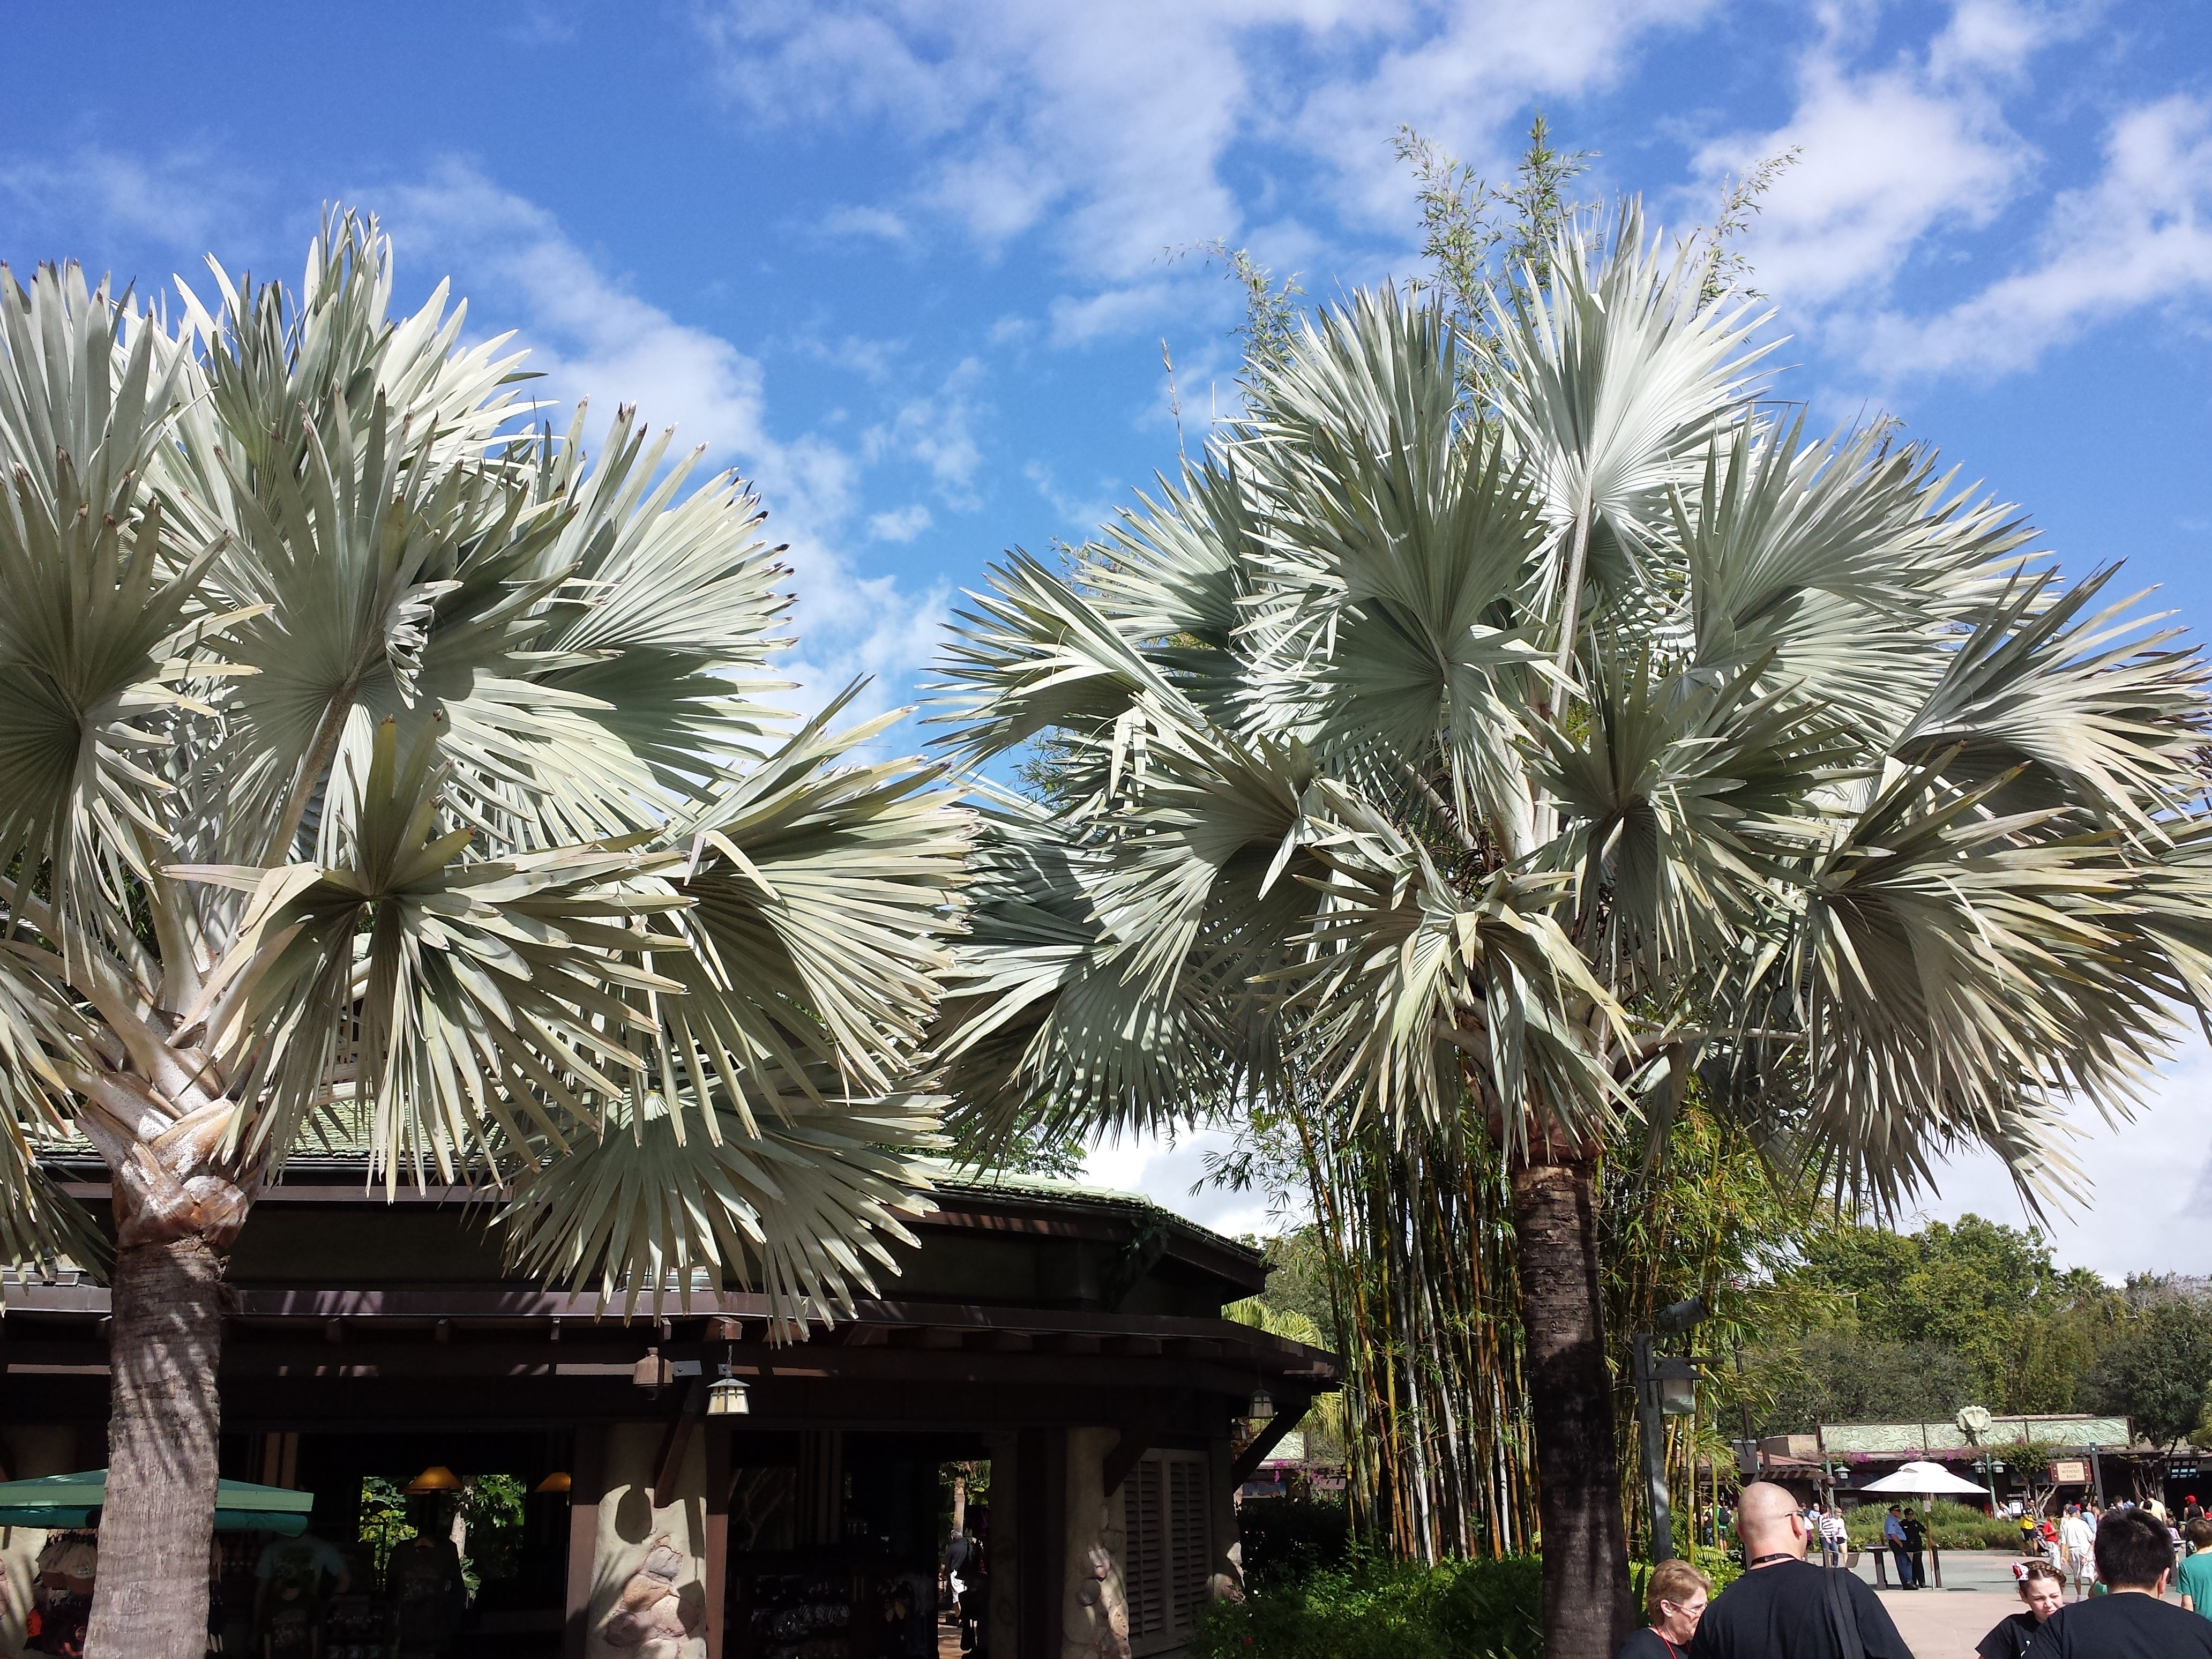 Florida sunshine and beautiful palm trees